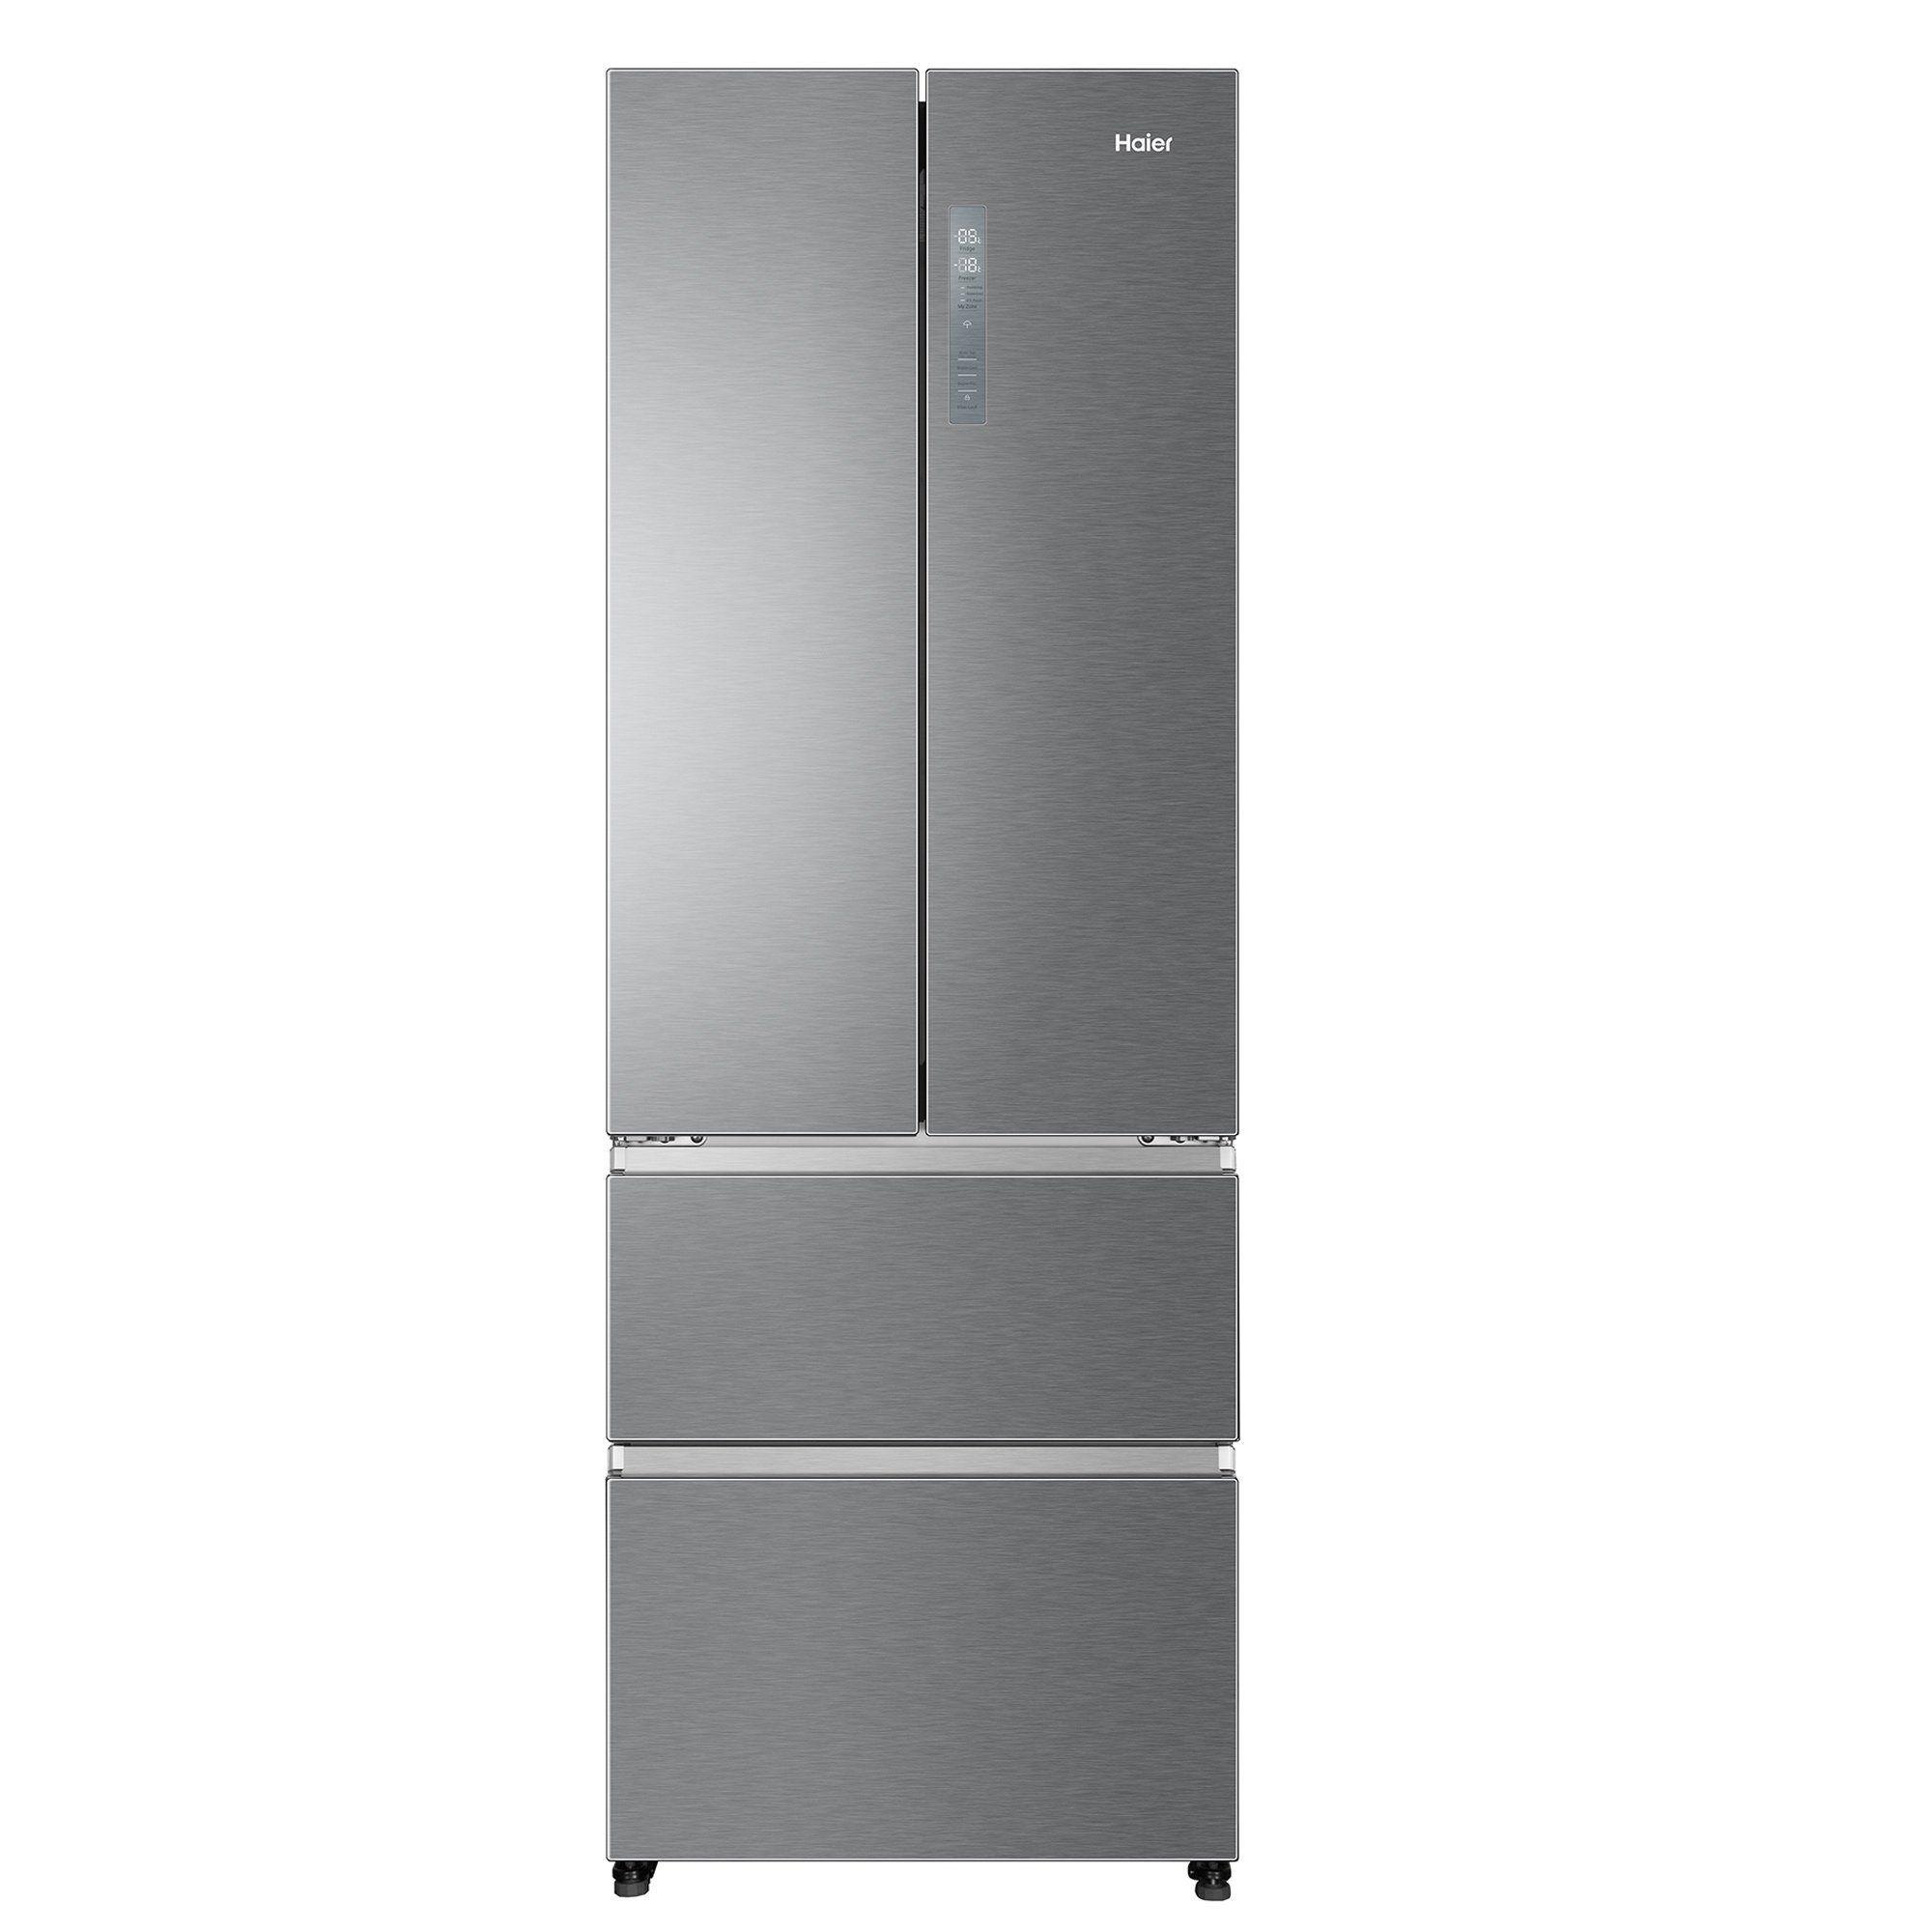 HAIER Kühlschrank HB20FPAAA, 200.5 cm hoch, 70 cm breit, A++ 3D Gefrierschubladen, Total No Frost, 2 Edelstahl - Flaschenregale, Energieeffizienzklasse A++